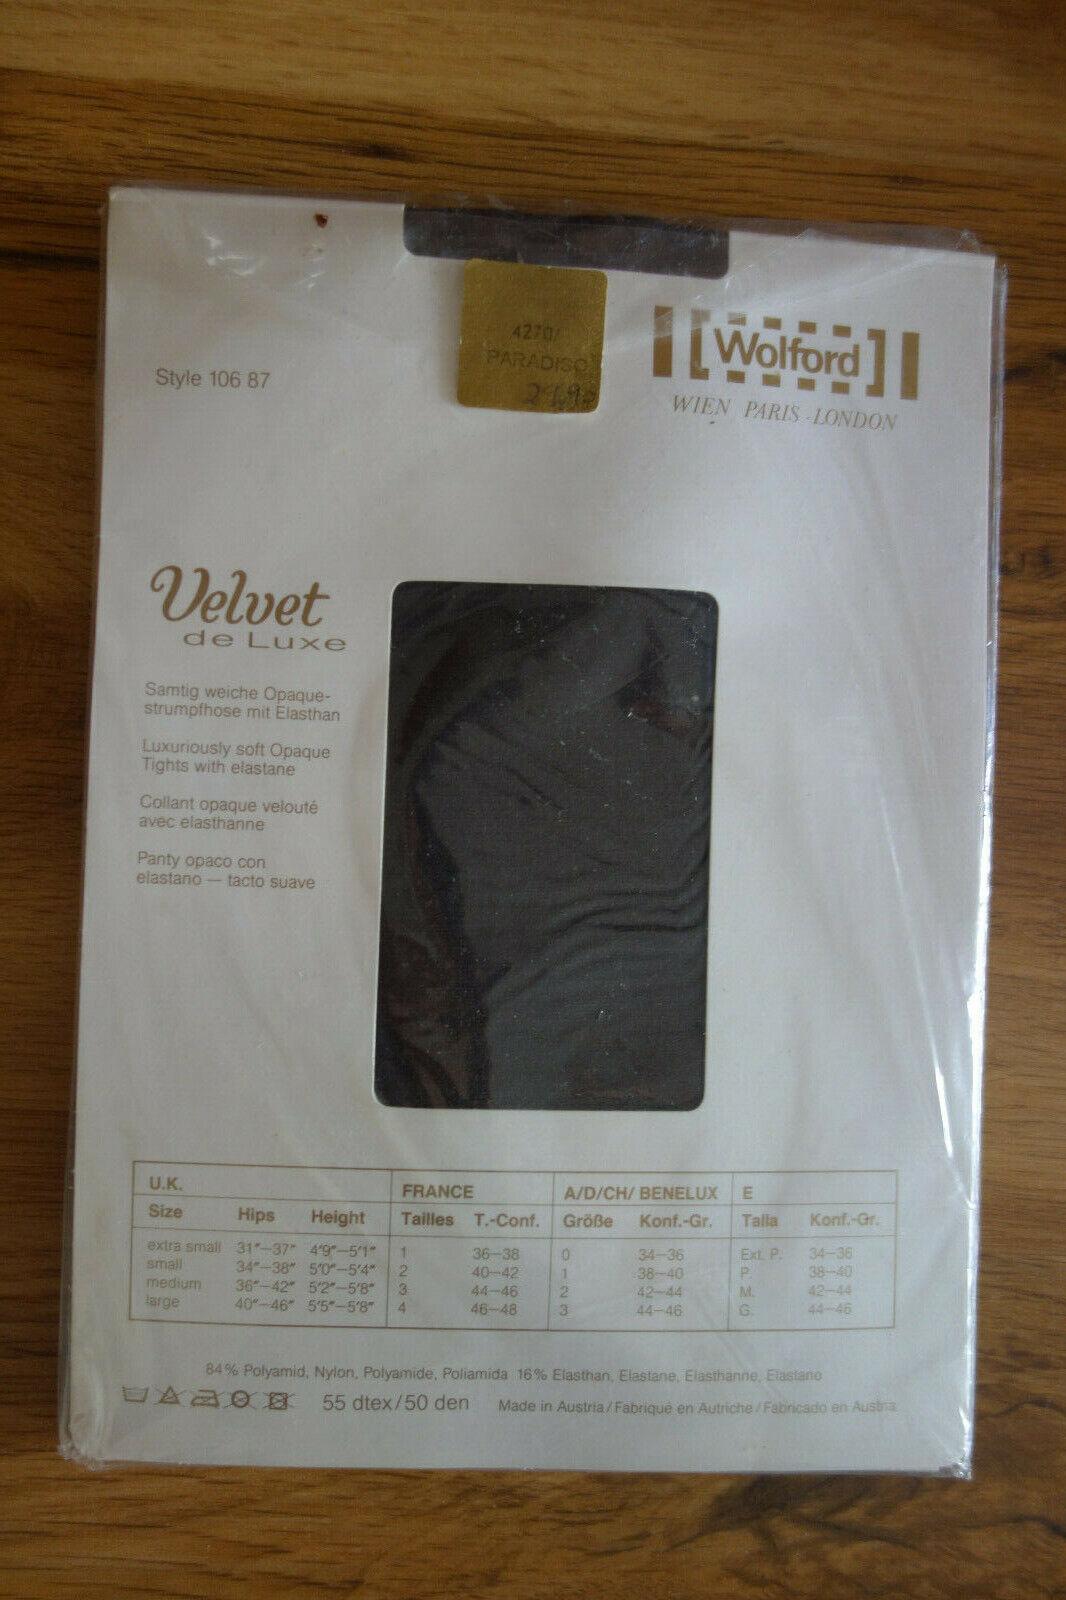 Strumpfhose WOLFORD Luxury Opaques Velvet de Luxe Gr: 42-44 Schwarz NEU!